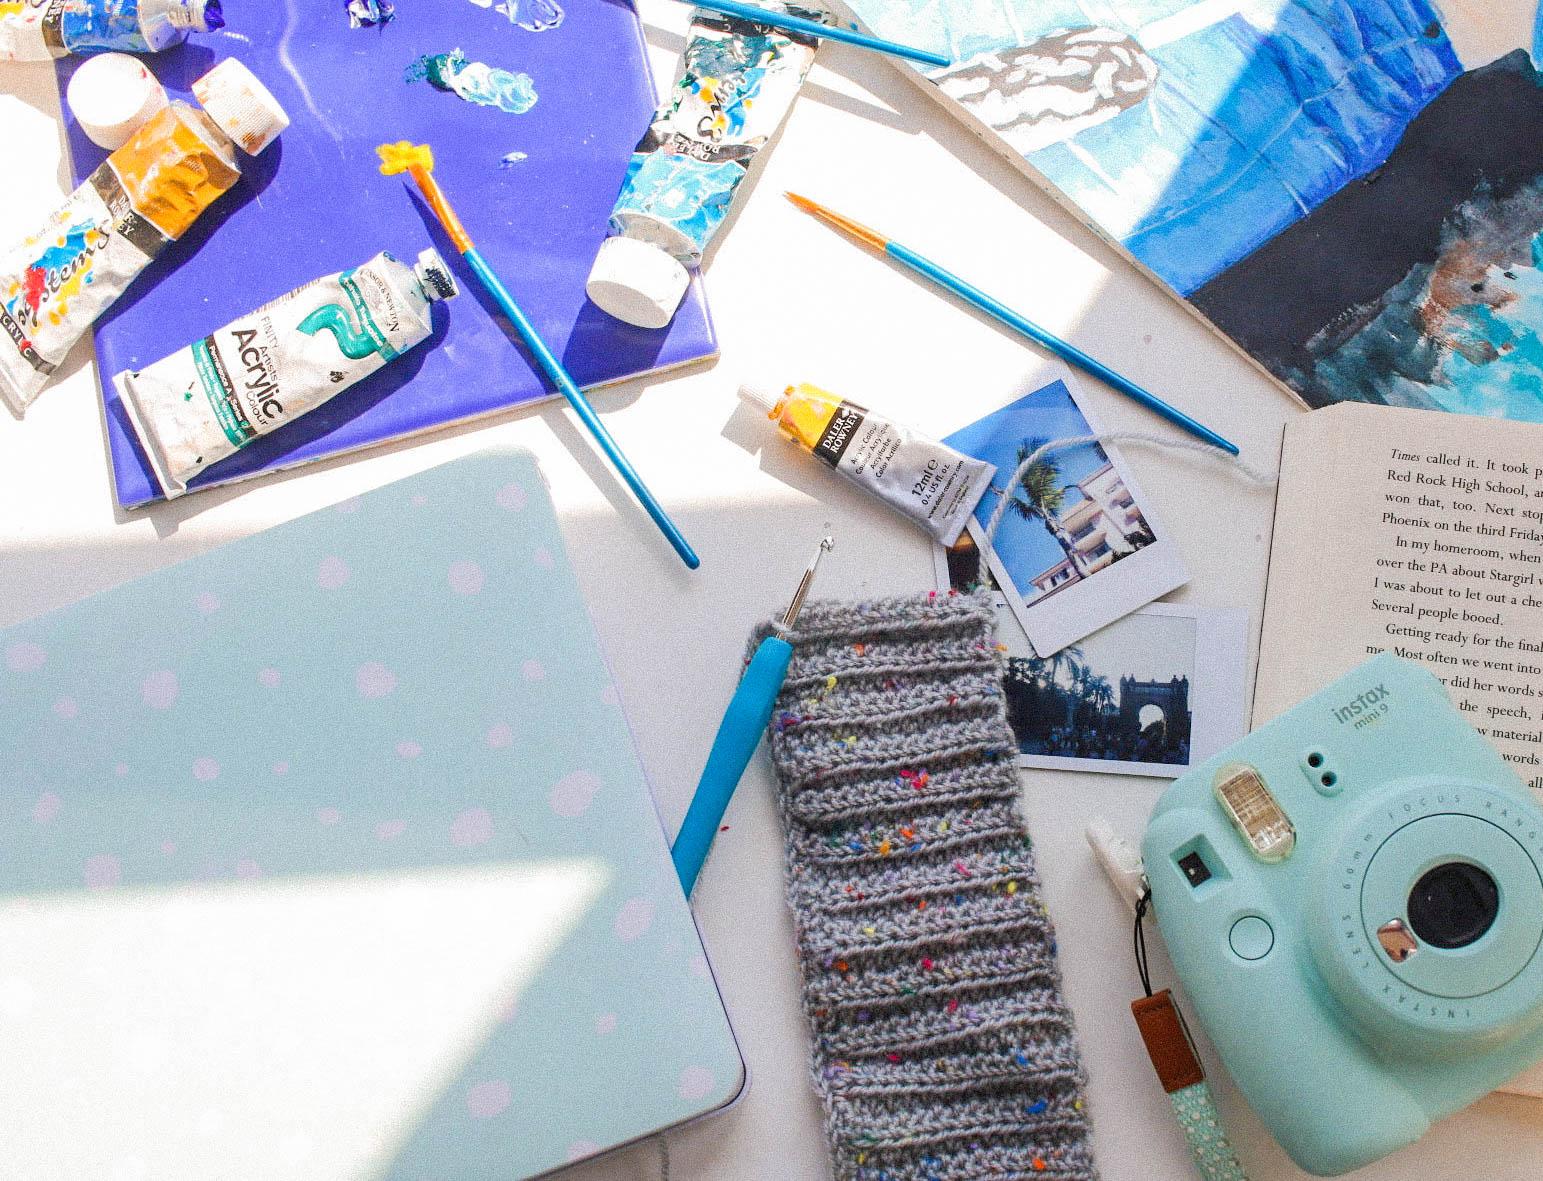 Activities to inspire creativity blog post - paint, art, crochet, writing, flowers